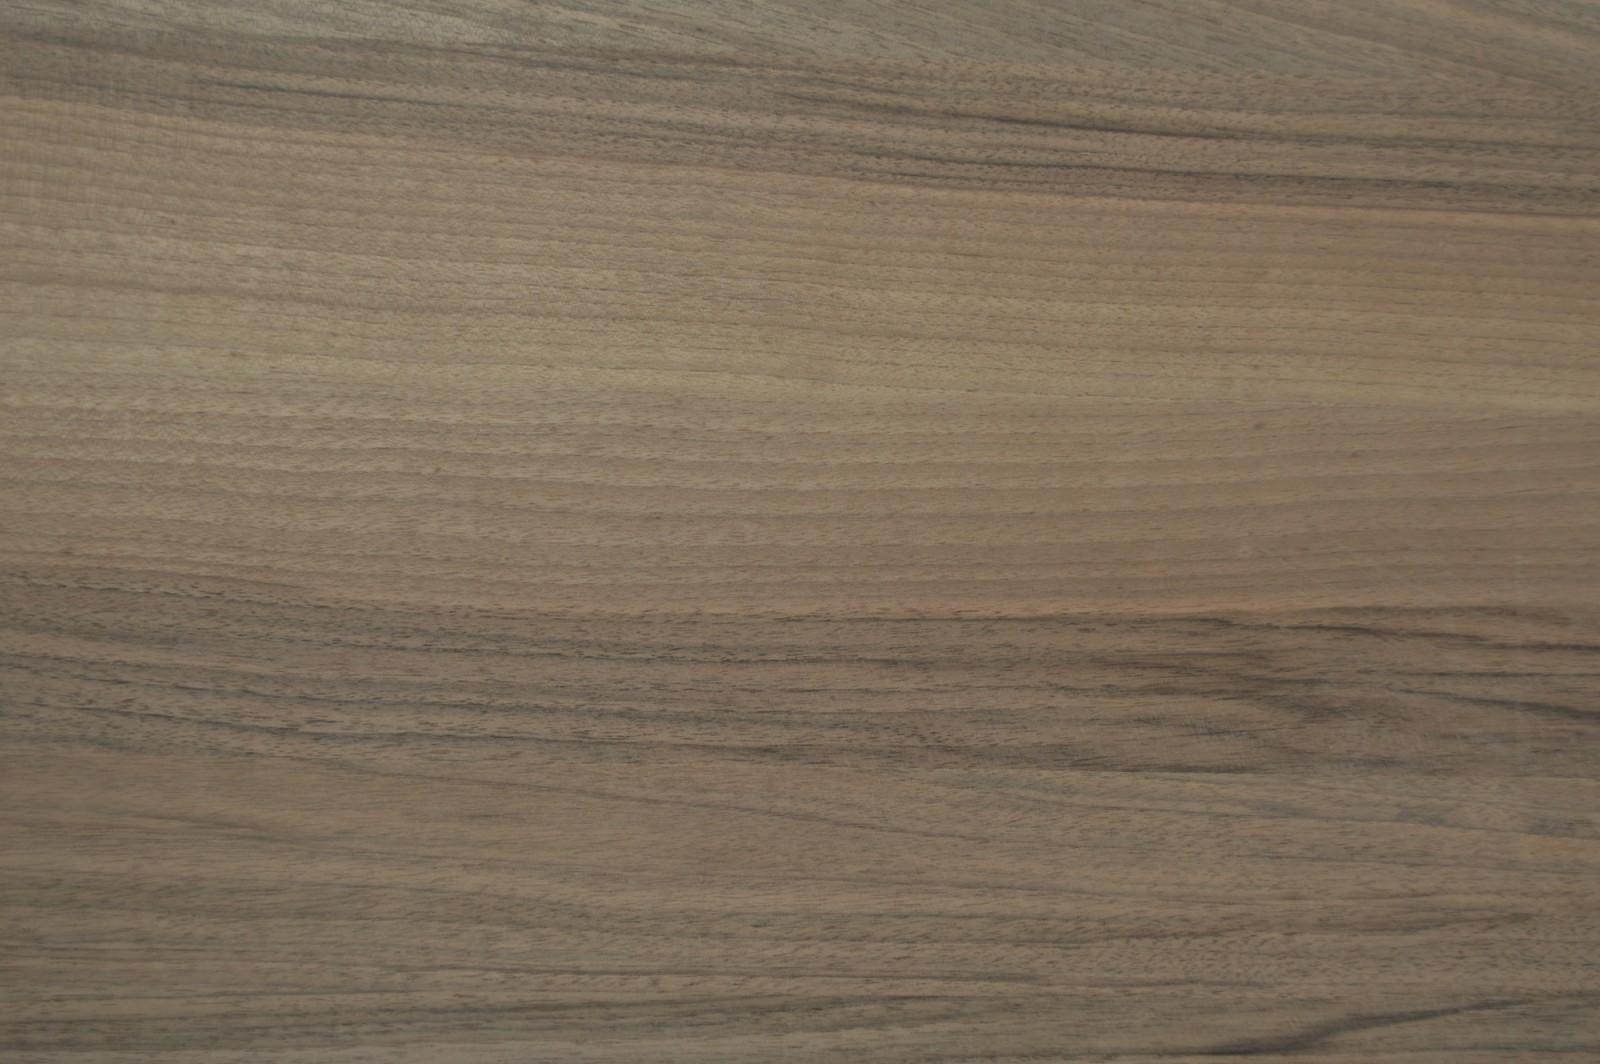 Quarter Cut European Walnut Unfinished - Real Wood Laminate ...